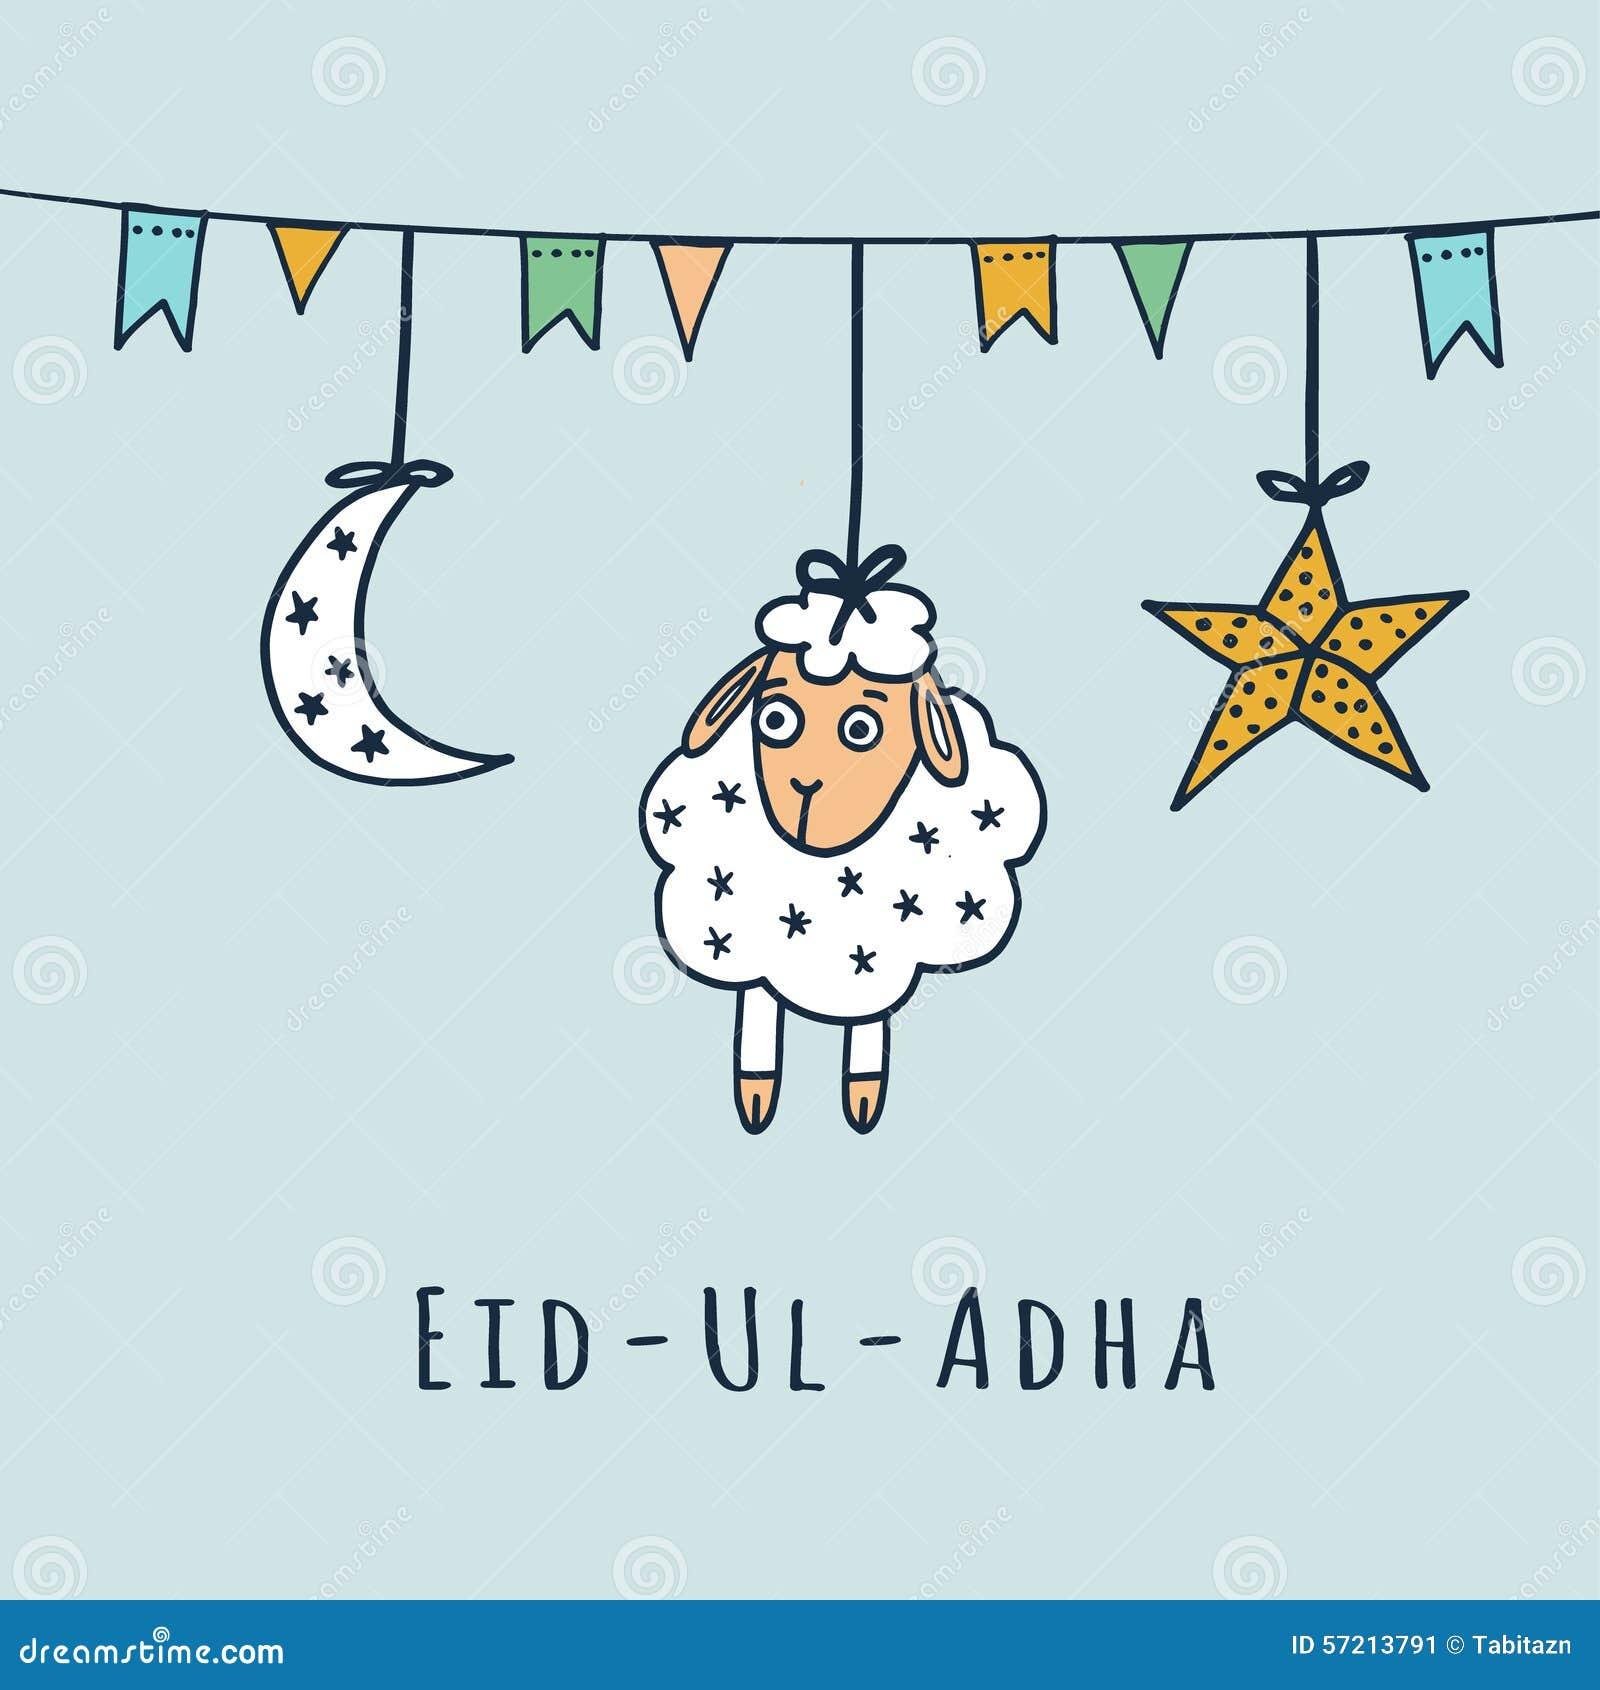 Eid ul adha greeting card with sheep moon star stock vector eid ul adha greeting card with sheep moon star m4hsunfo